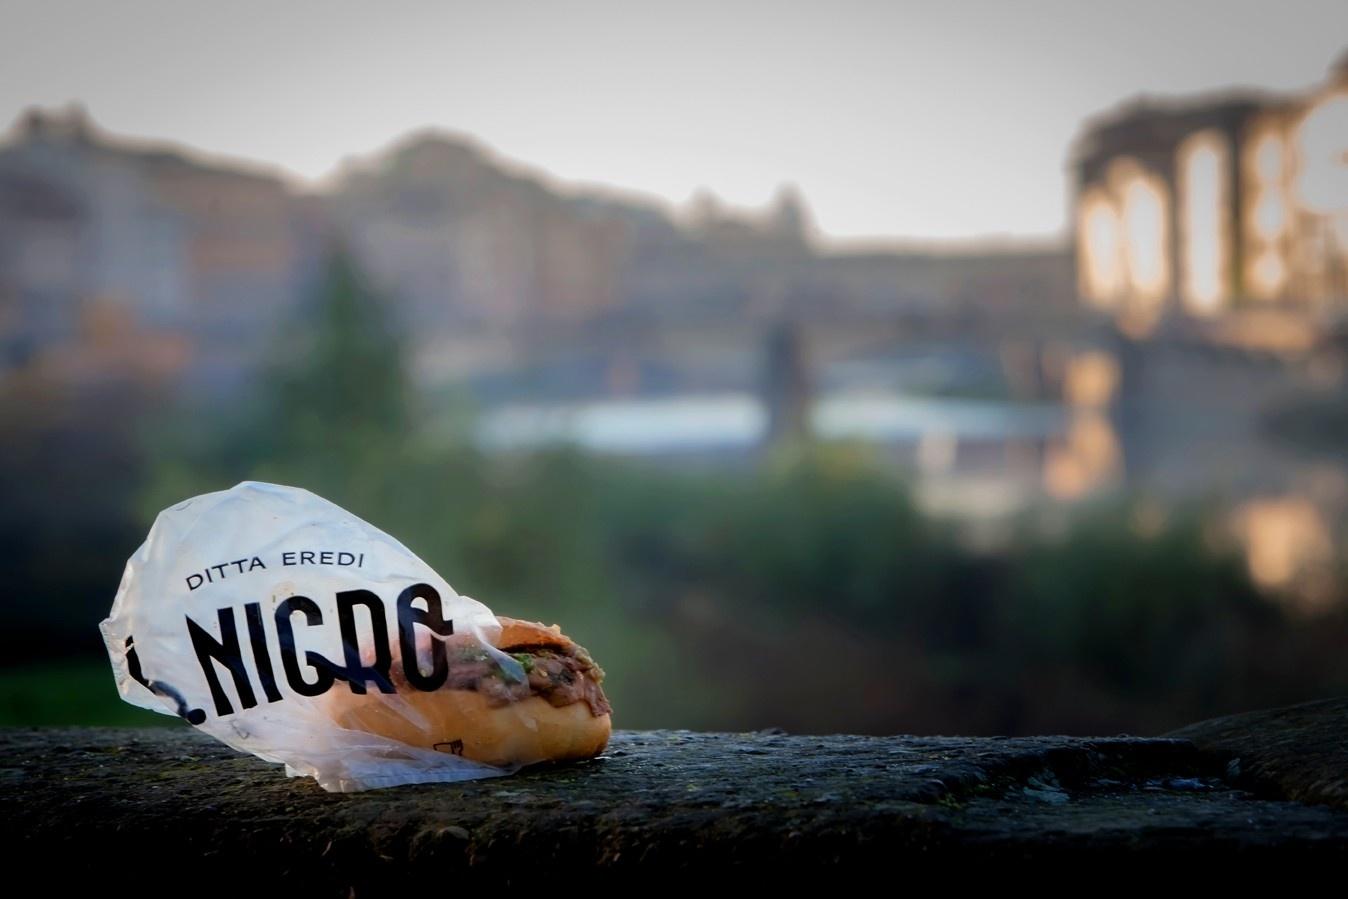 Foodmoodmag Firenze A Tutto Streetfood Con Gli Eredi Nigro